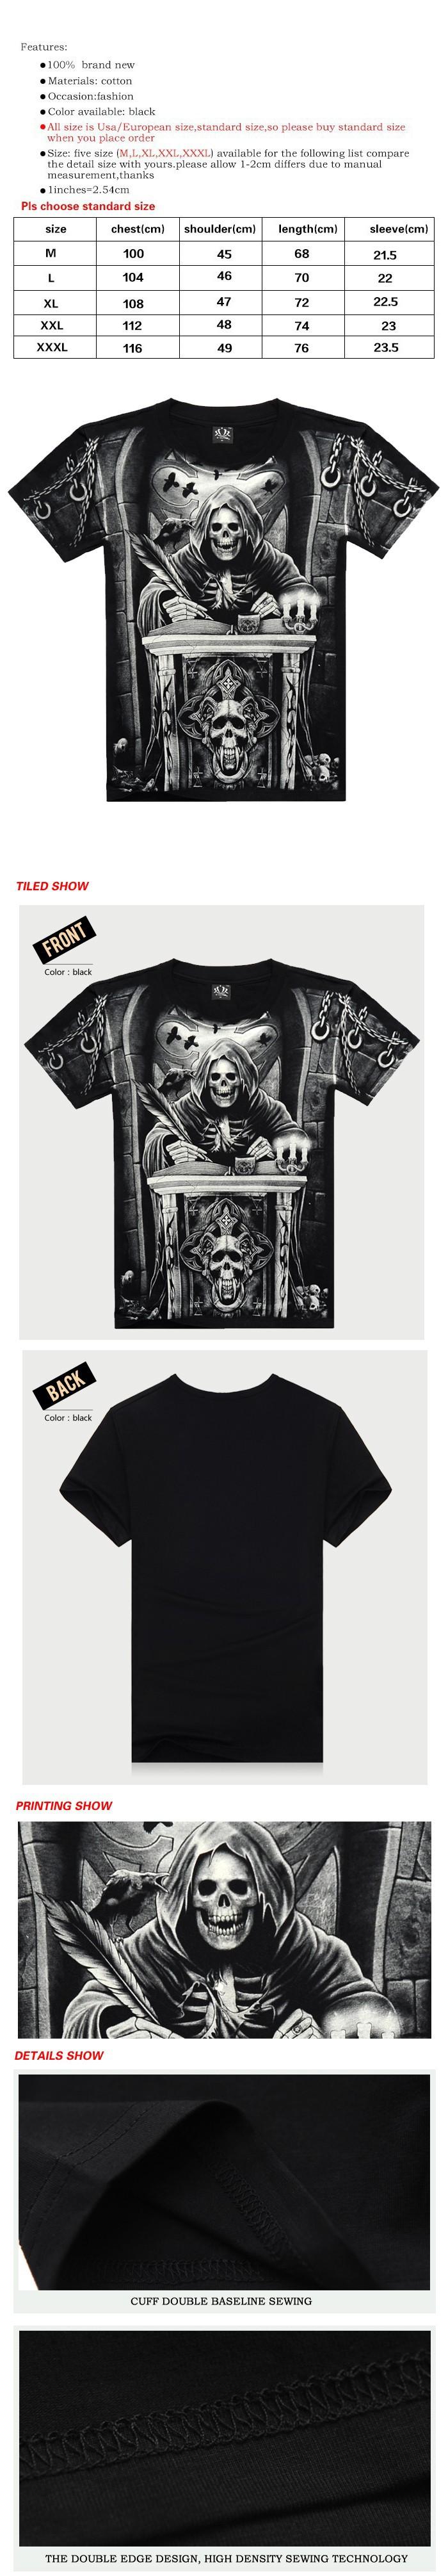 Summer Hot Sale Cool Fashion Men's Clothing O-neck Short Sleeve Men Shirts 3D Full Printed T Shirt men Tshirts Tops Tees For Man